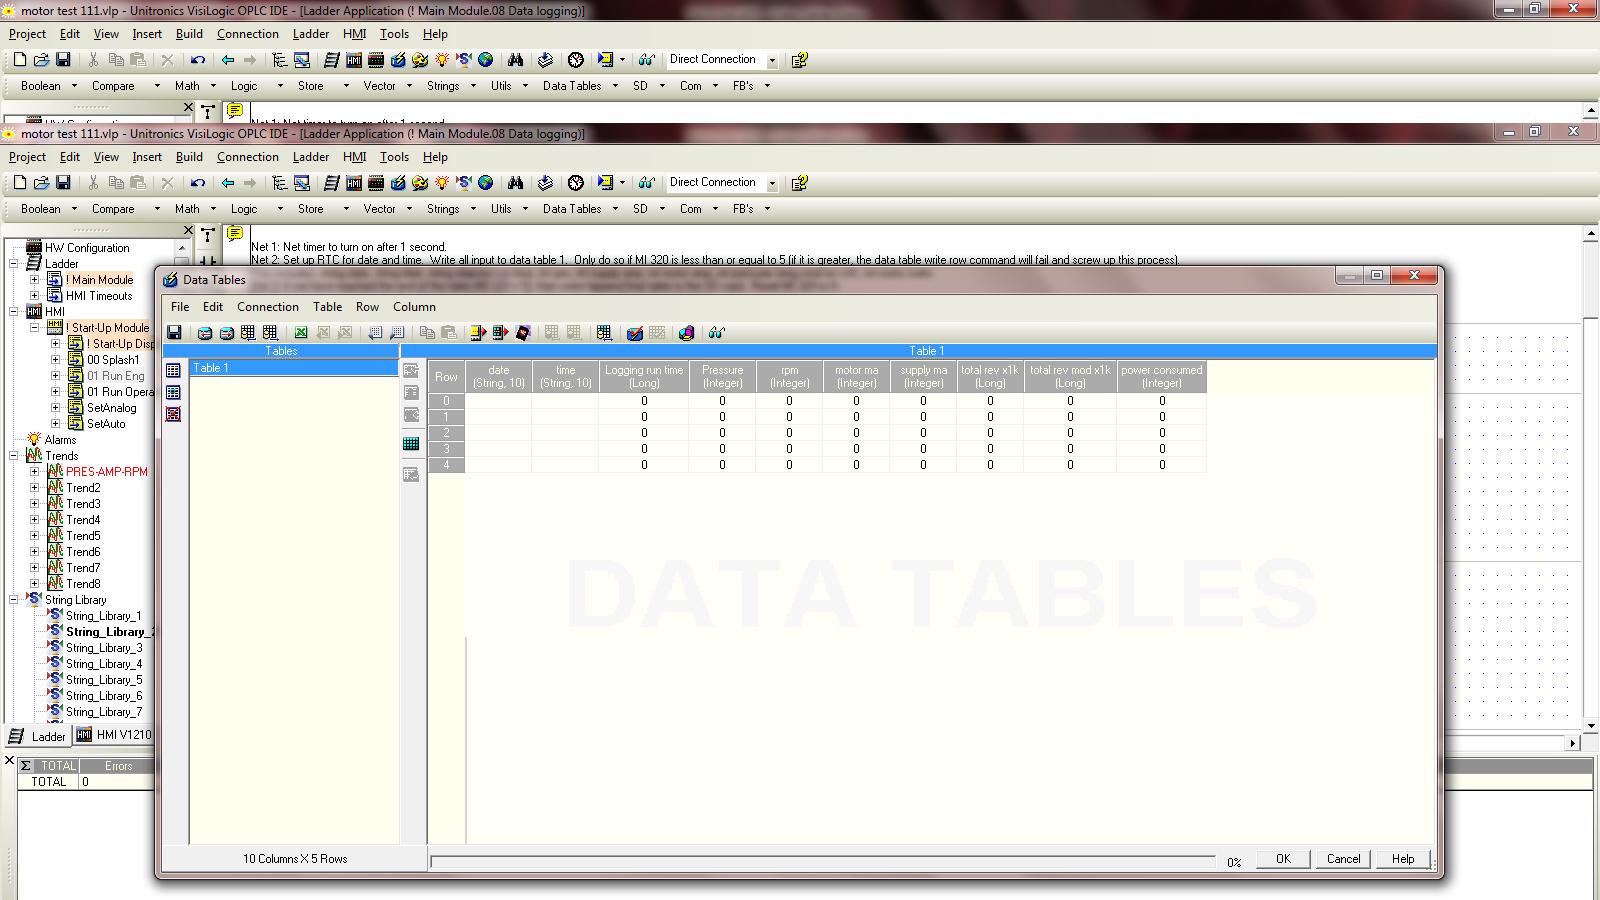 Data Logging stops after ~30 minutes - Vision & Samba PLC +